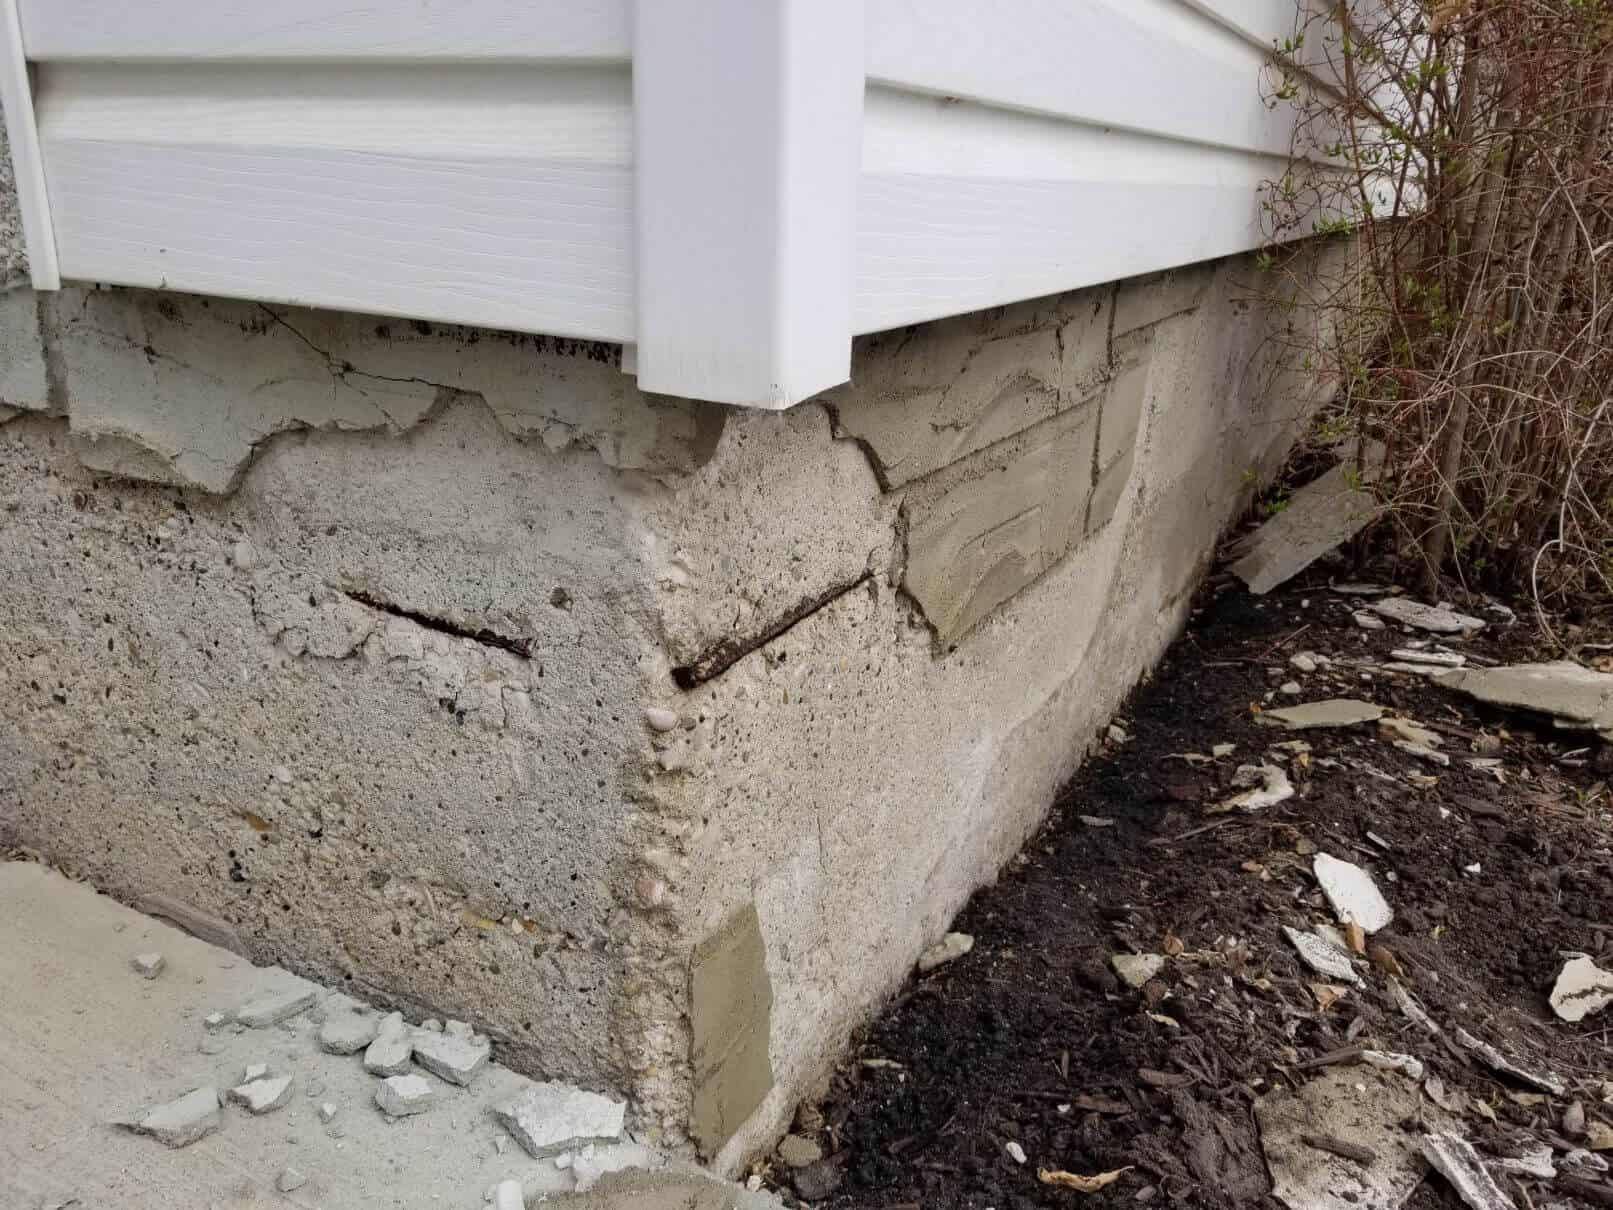 crumbling parging falling off